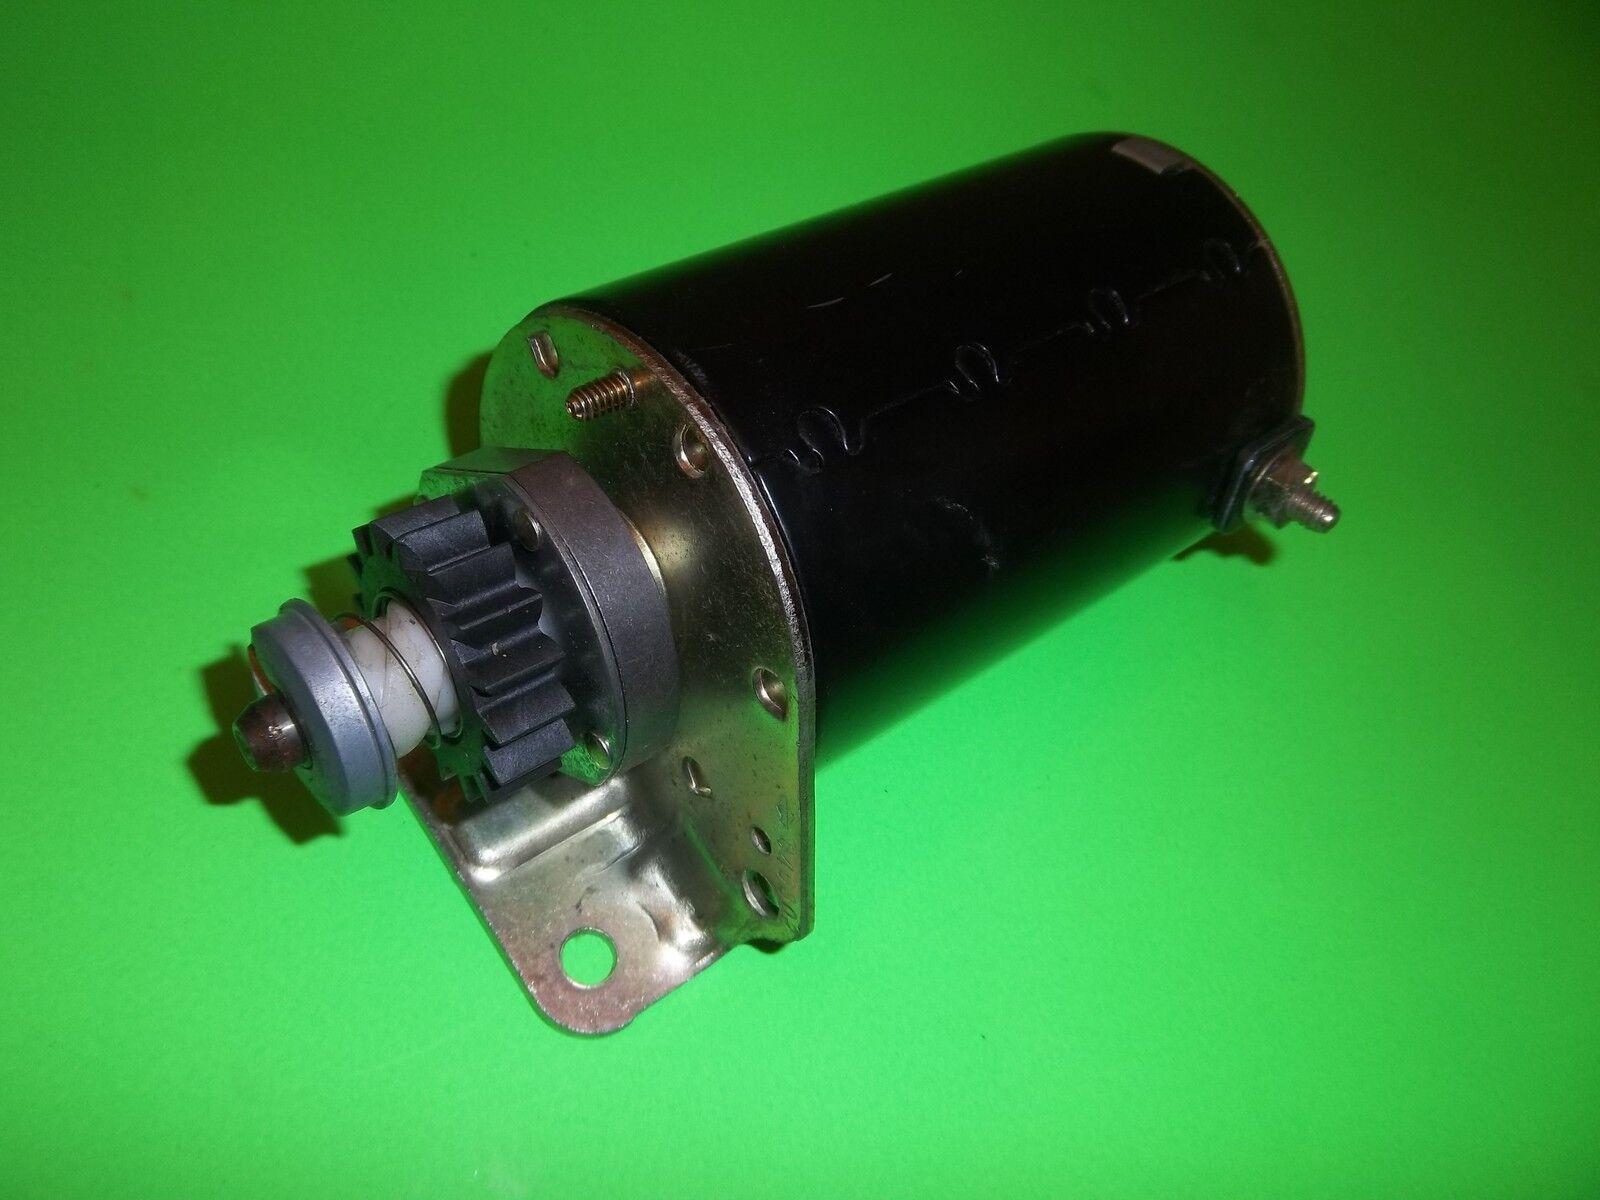 Toro timecutter 14 16 Hp Elect Estrellater encaja monocilíndrico motores Oem